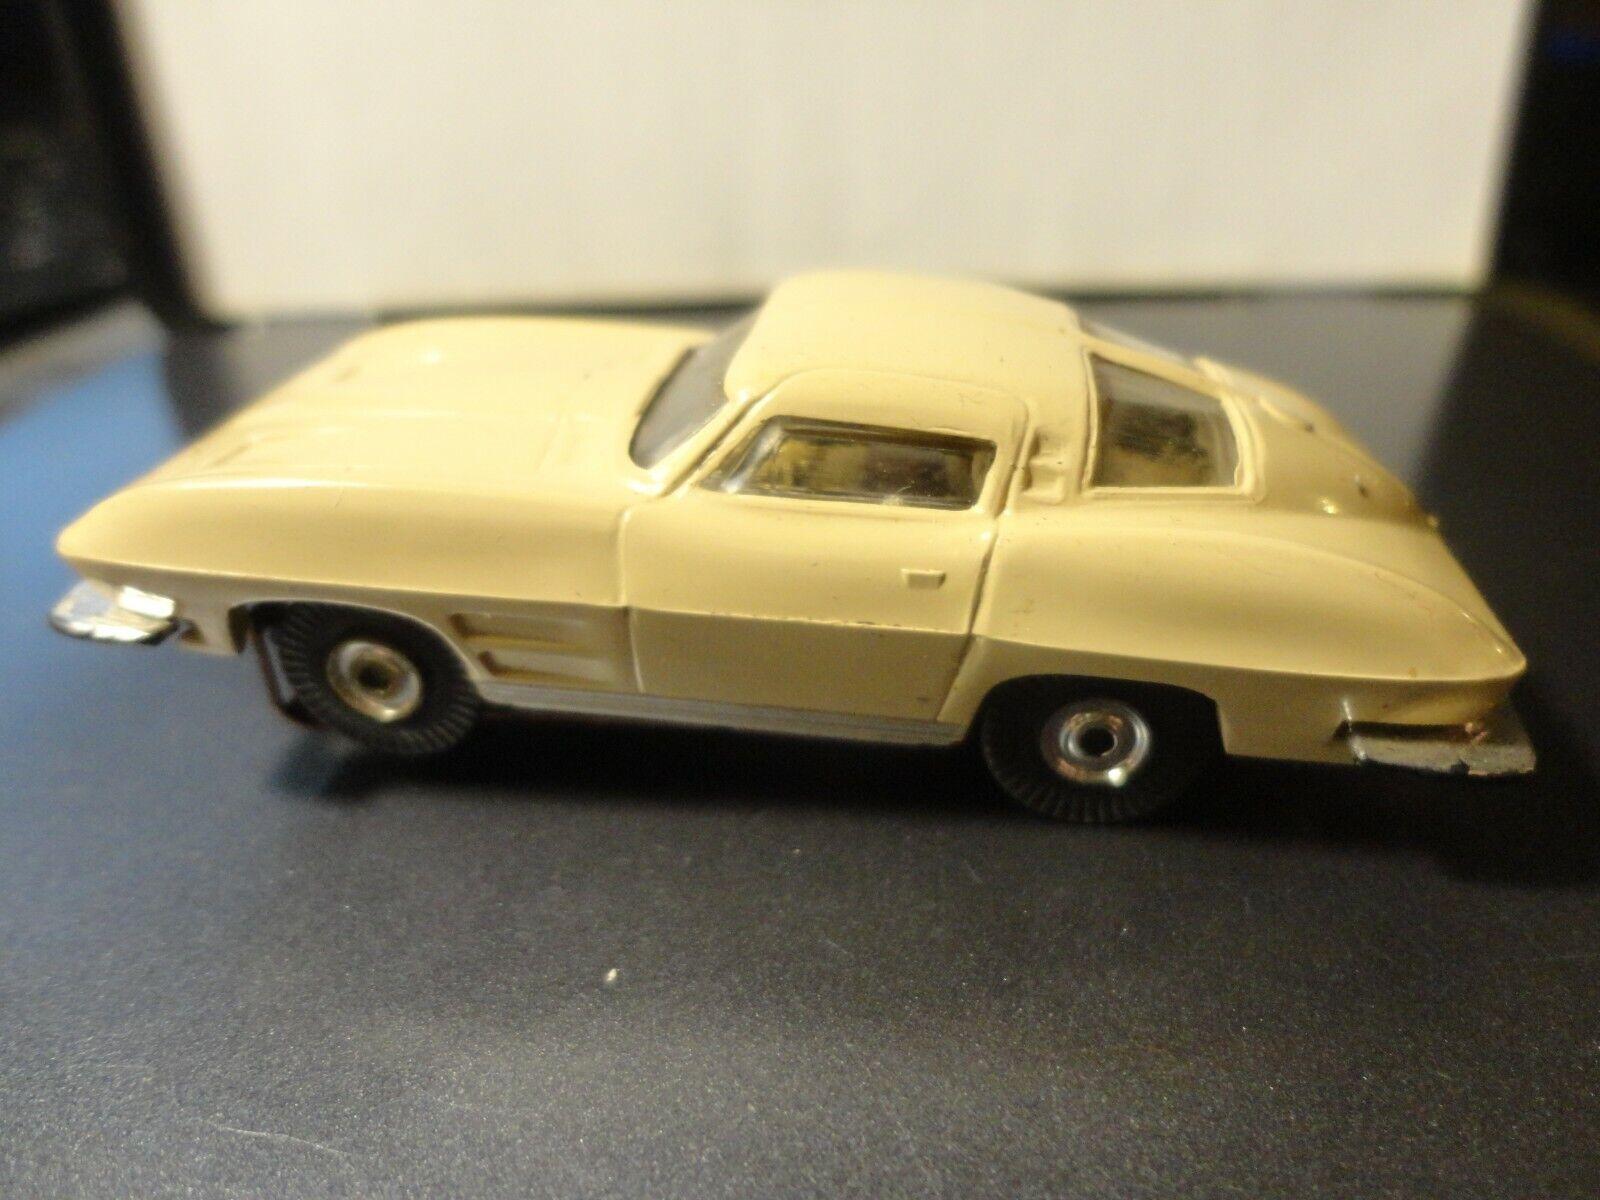 Vintage Aurora Tjet Ho Slot Car Tan Corvette - $48.00